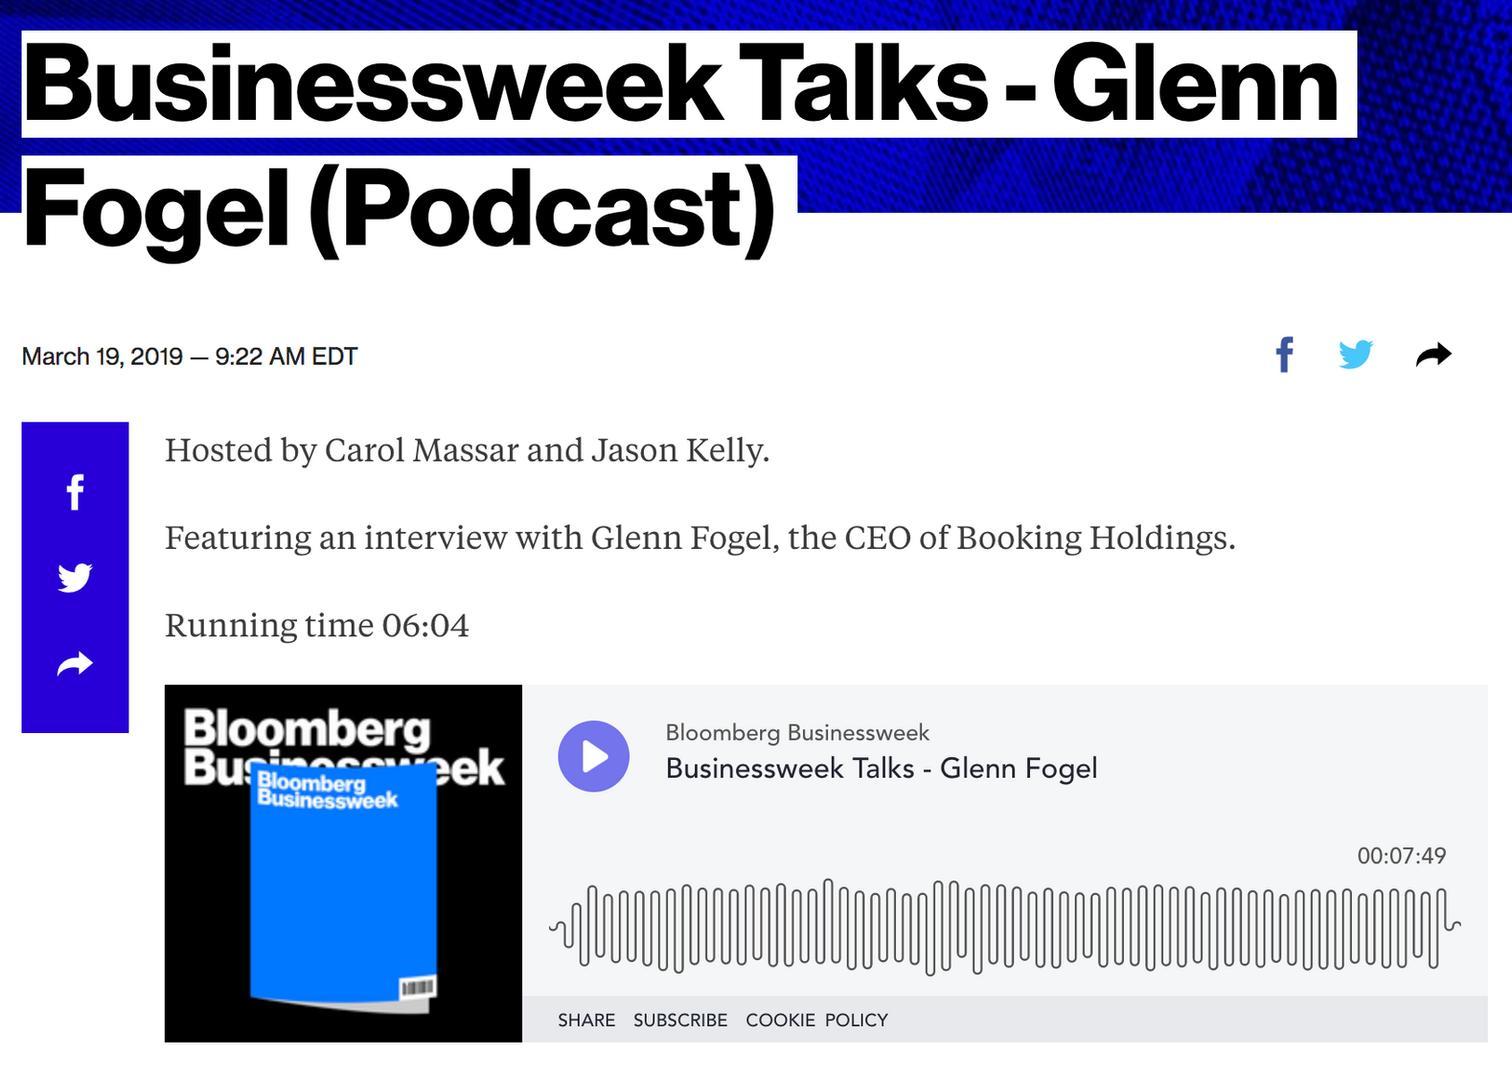 Businessweek Talks Podcast